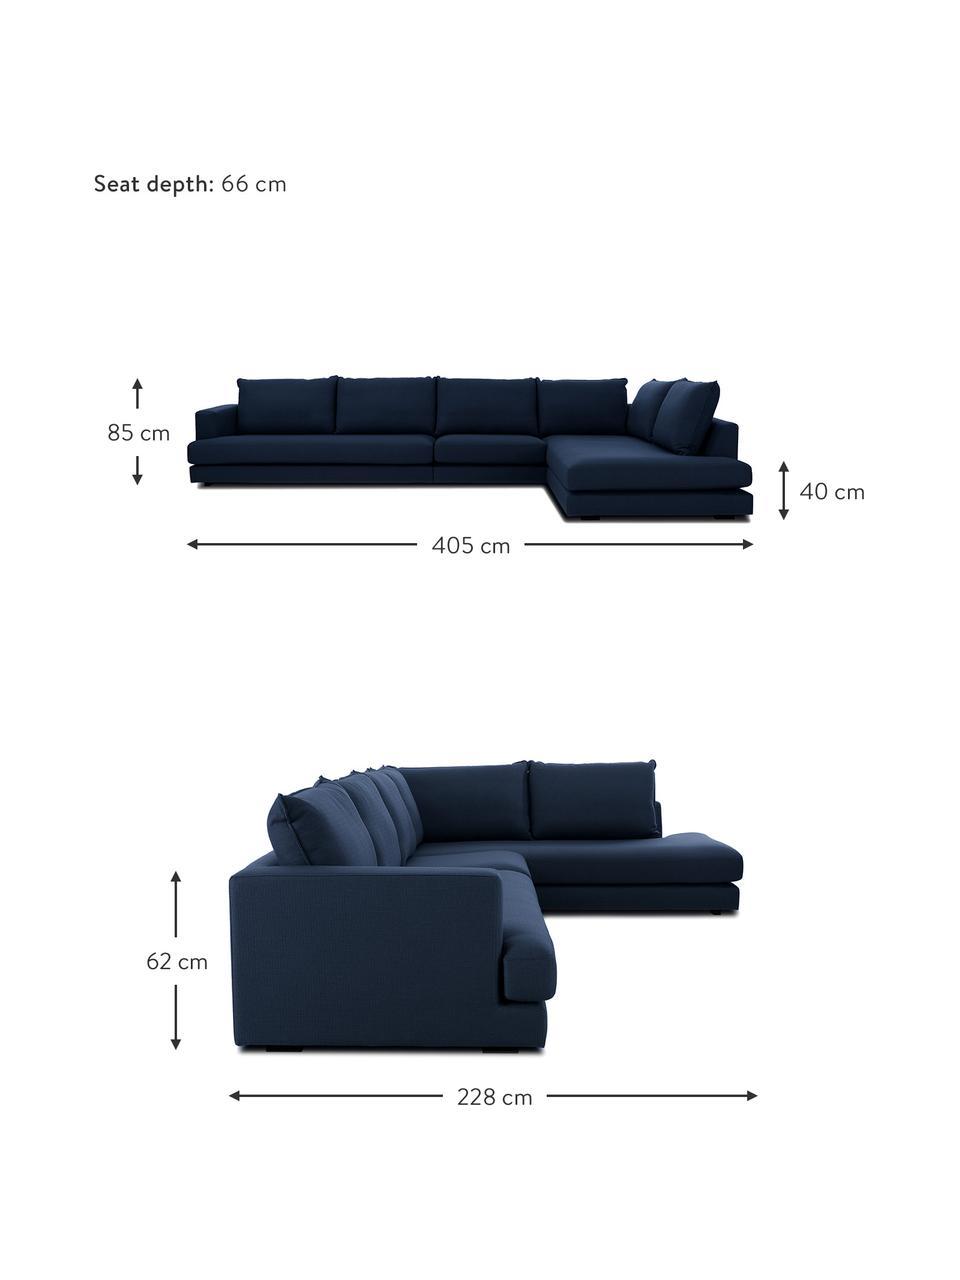 XL-Ecksofa Tribeca in Dunkelblau, Bezug: 100% Polyester Der hochwe, Gestell: Massives Buchenholz, Füße: Massives Buchenholz, lack, Webstoff Dunkelblau, B 405 x T 228 cm